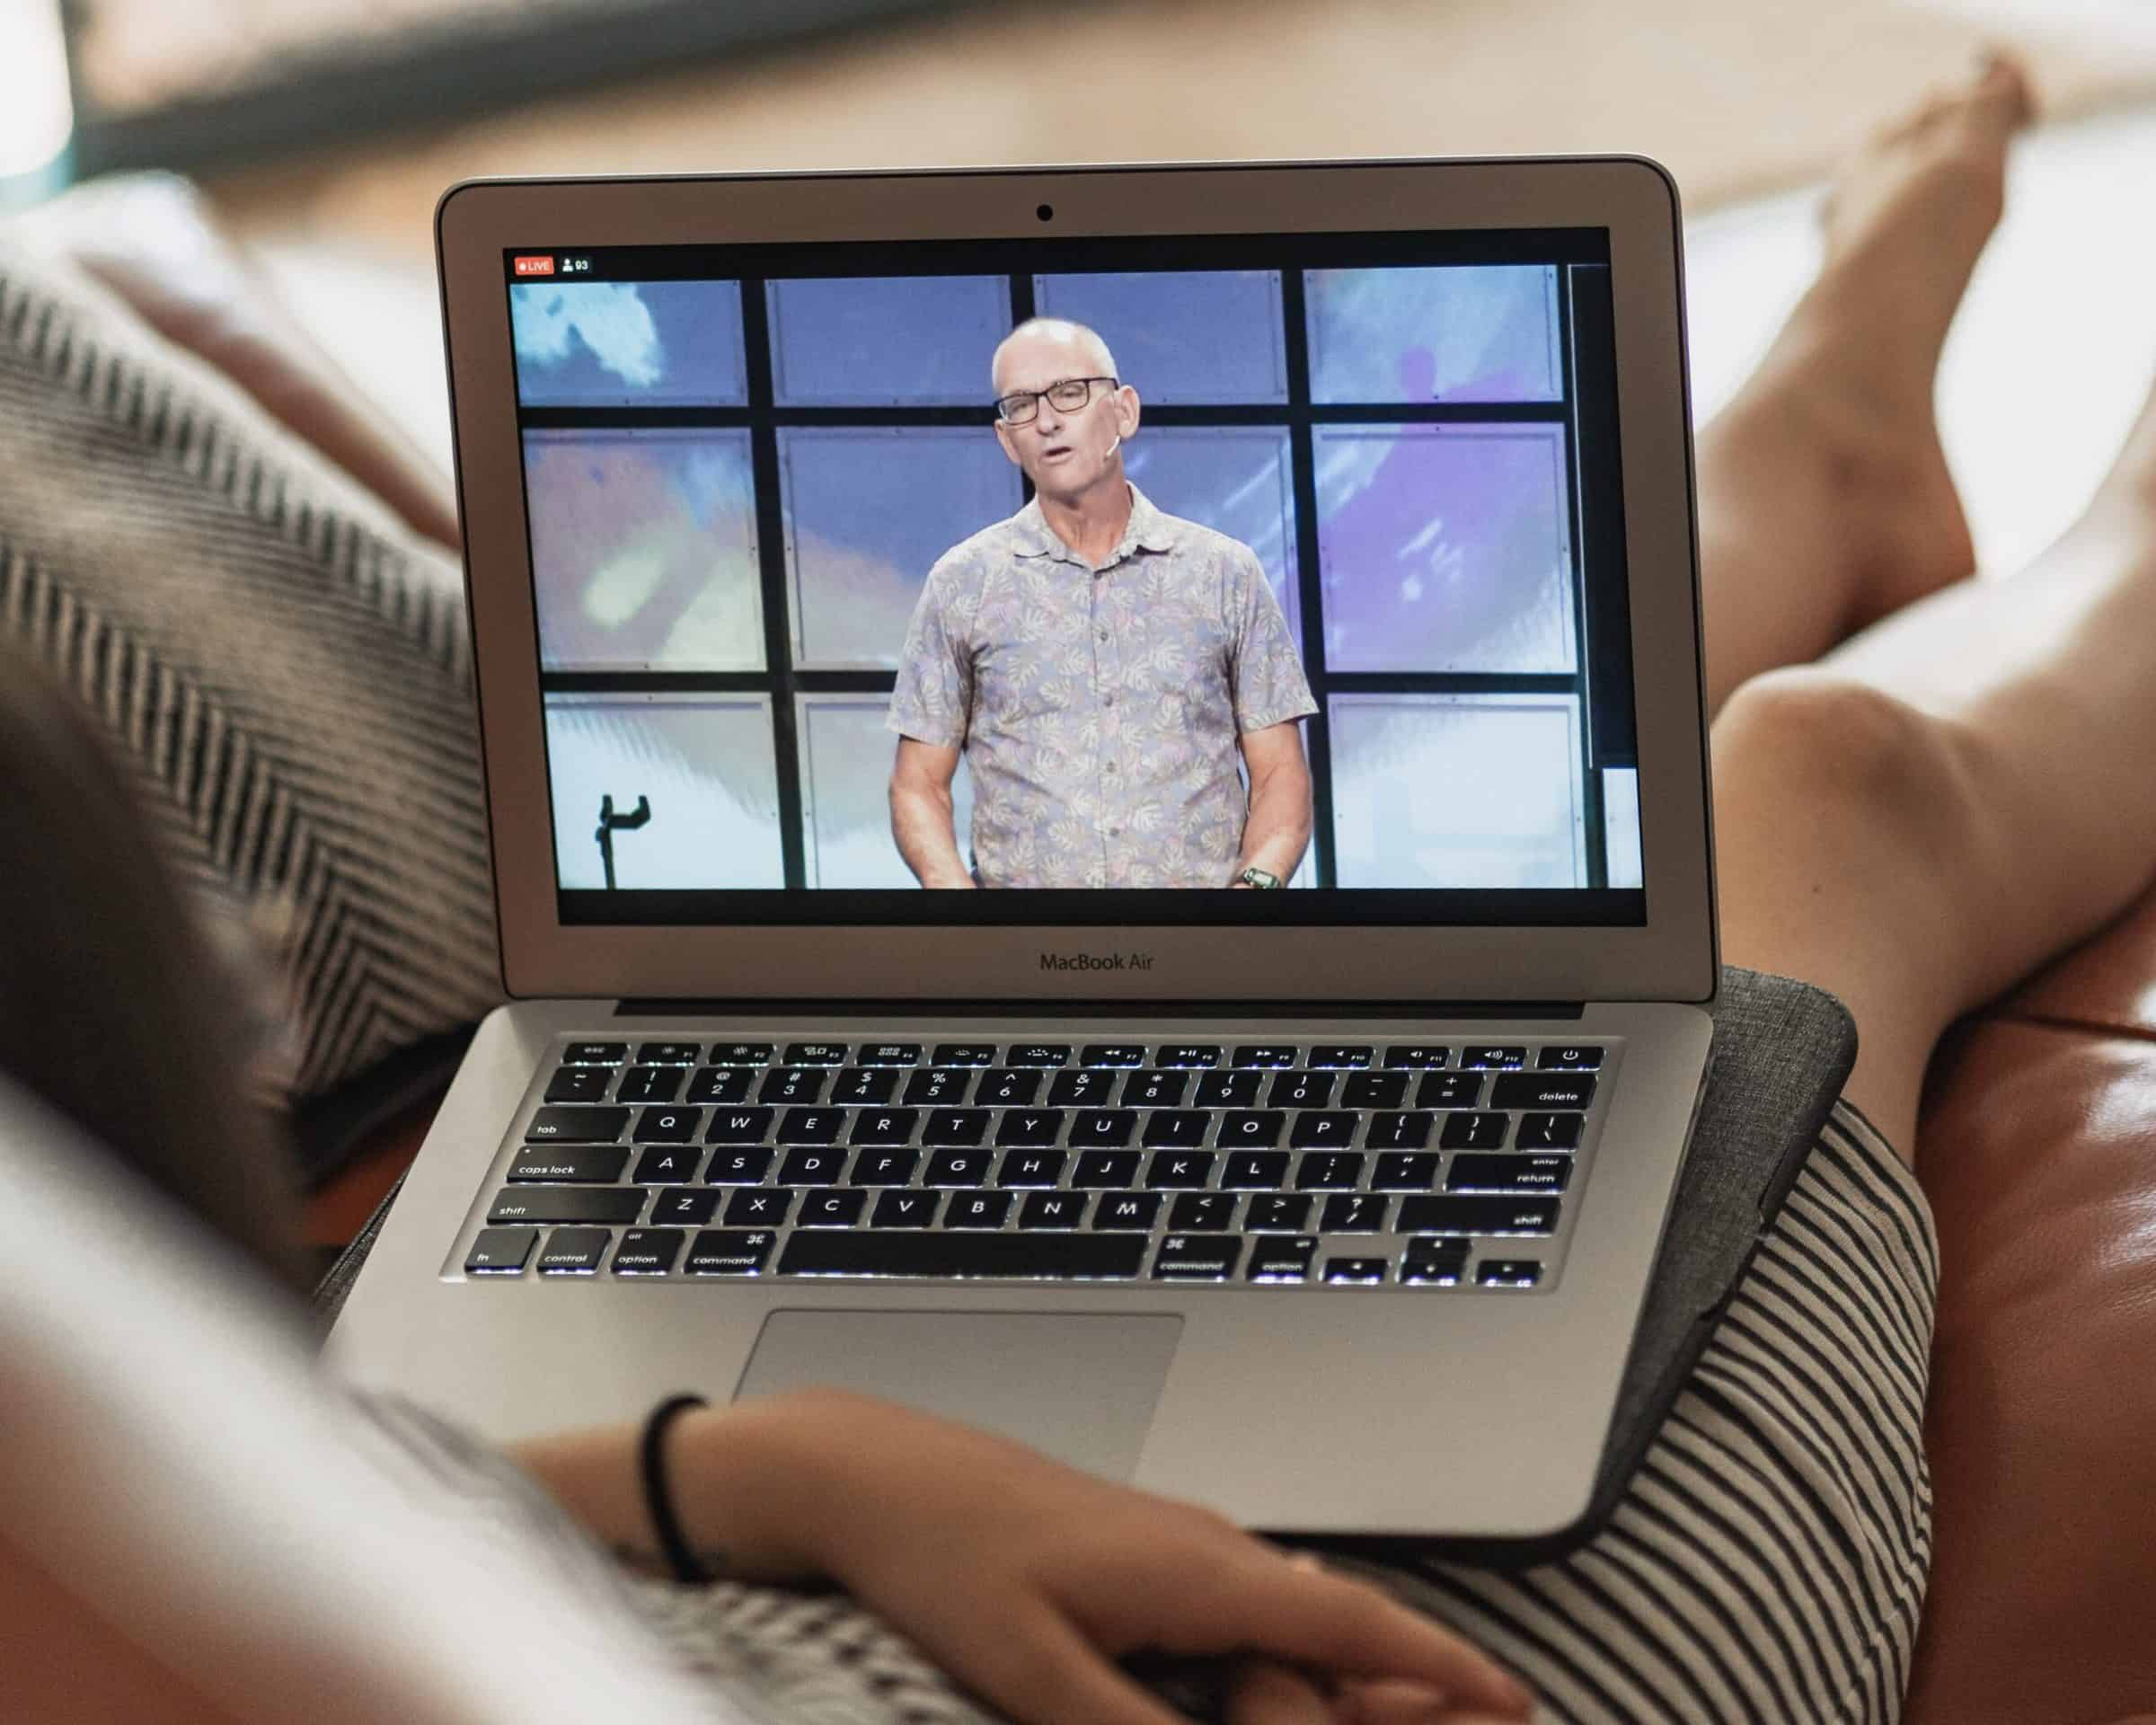 Momice - online events - virtual events - livestream - interactie - formats